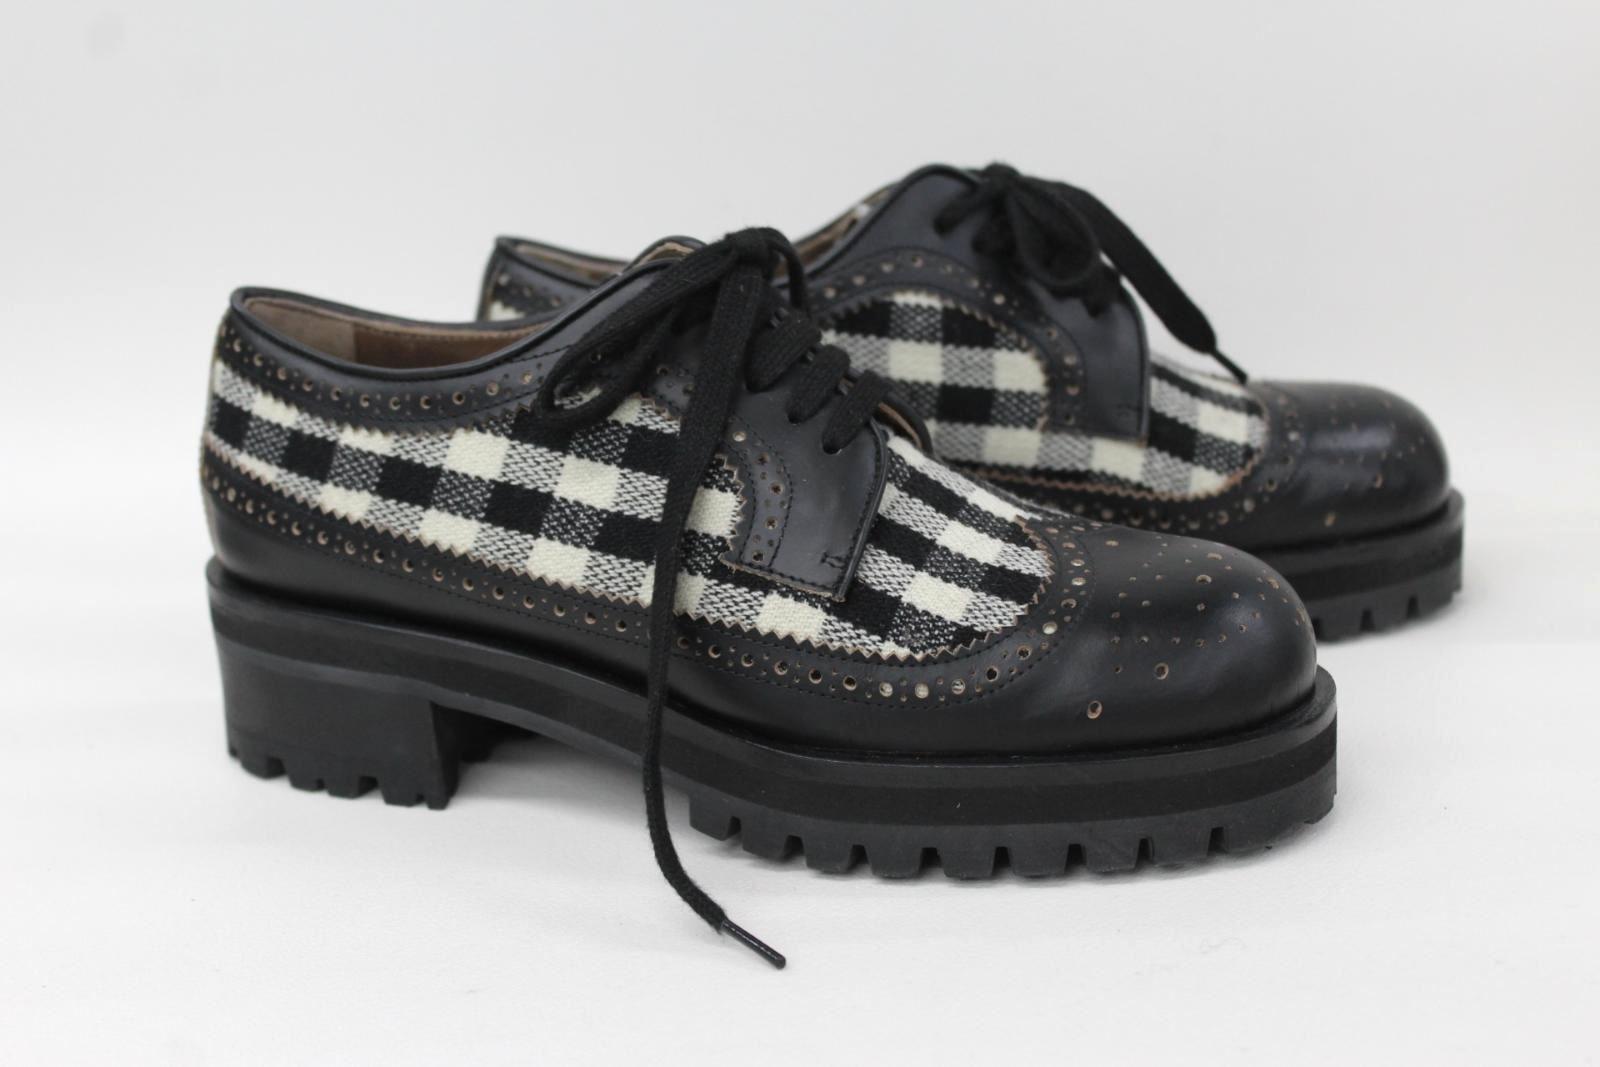 MARNI-Ladies-Black-amp-White-Check-Chunky-Sole-Lace-Up-Brogue-Shoes-UK4-EU37